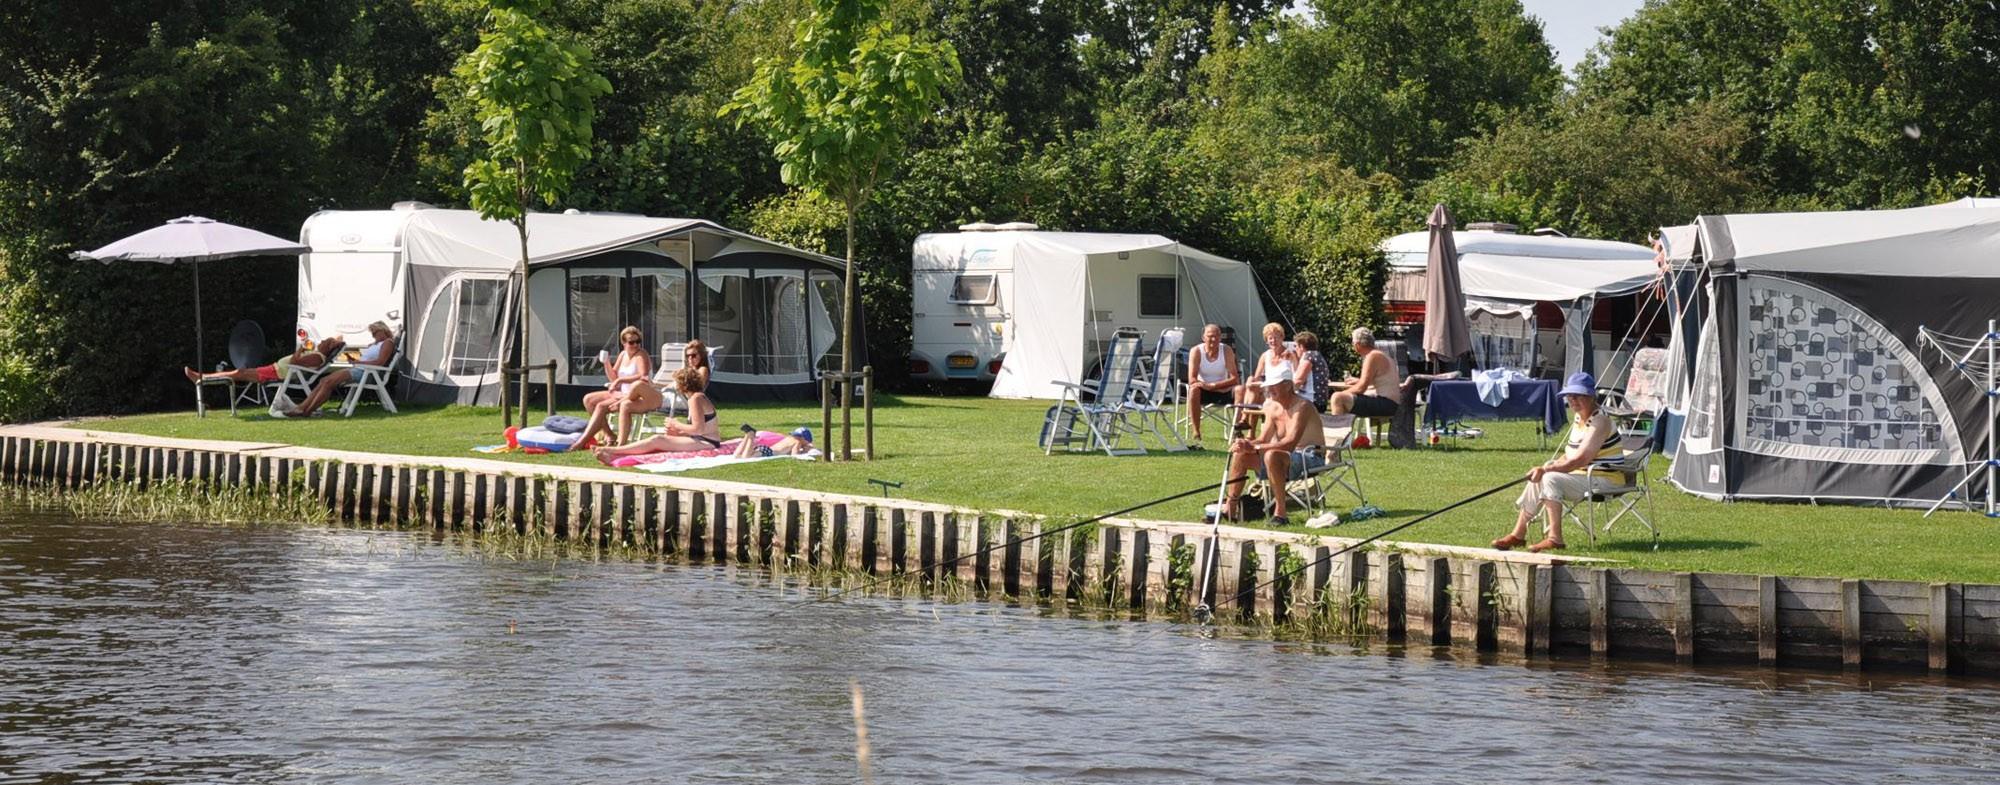 Camping aan het water in Friesland